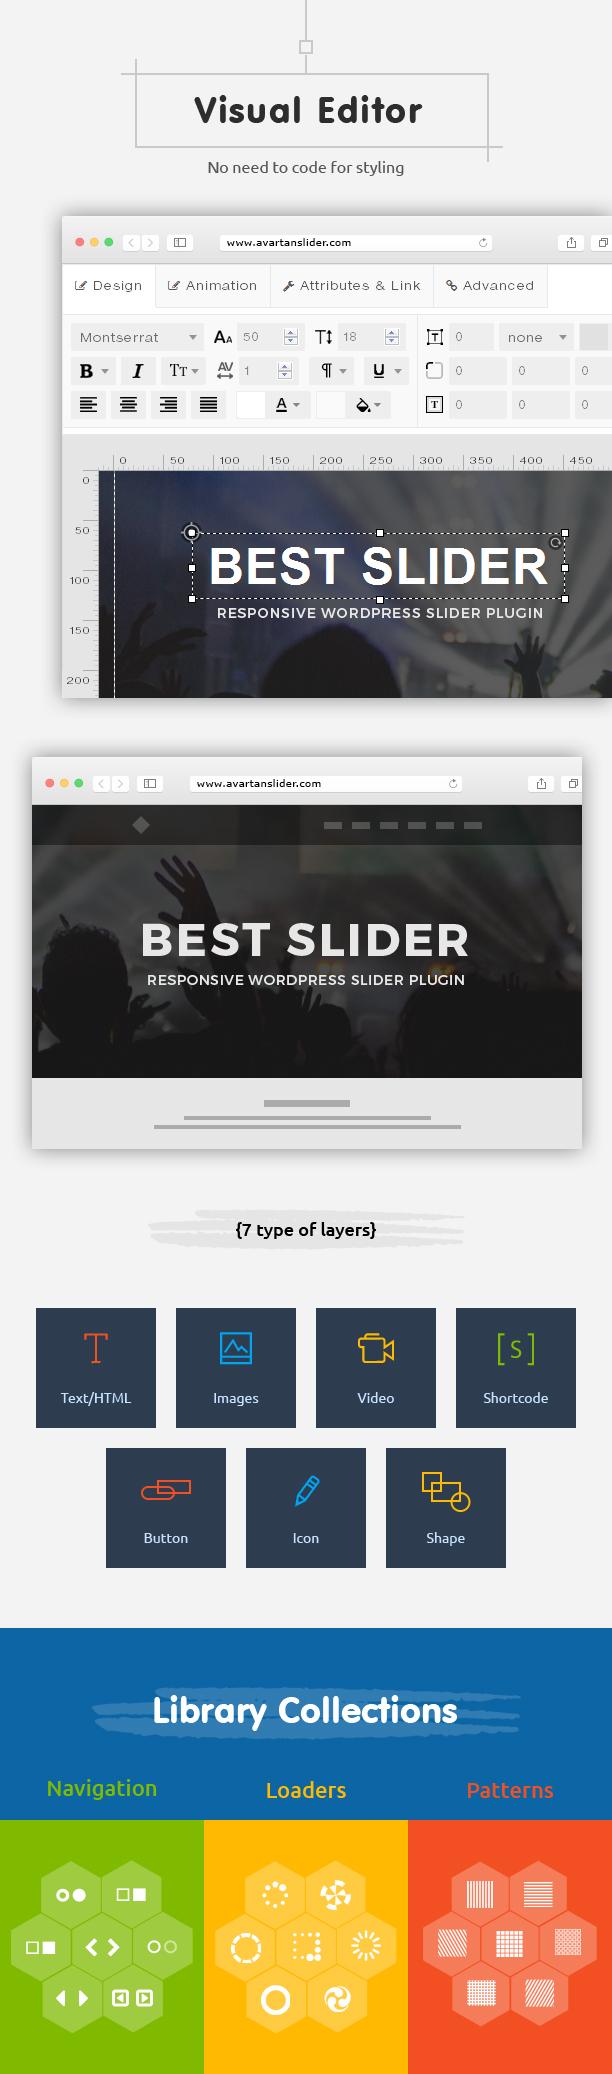 WordPress Slider - Avartan Slider with Advance Visual Editor